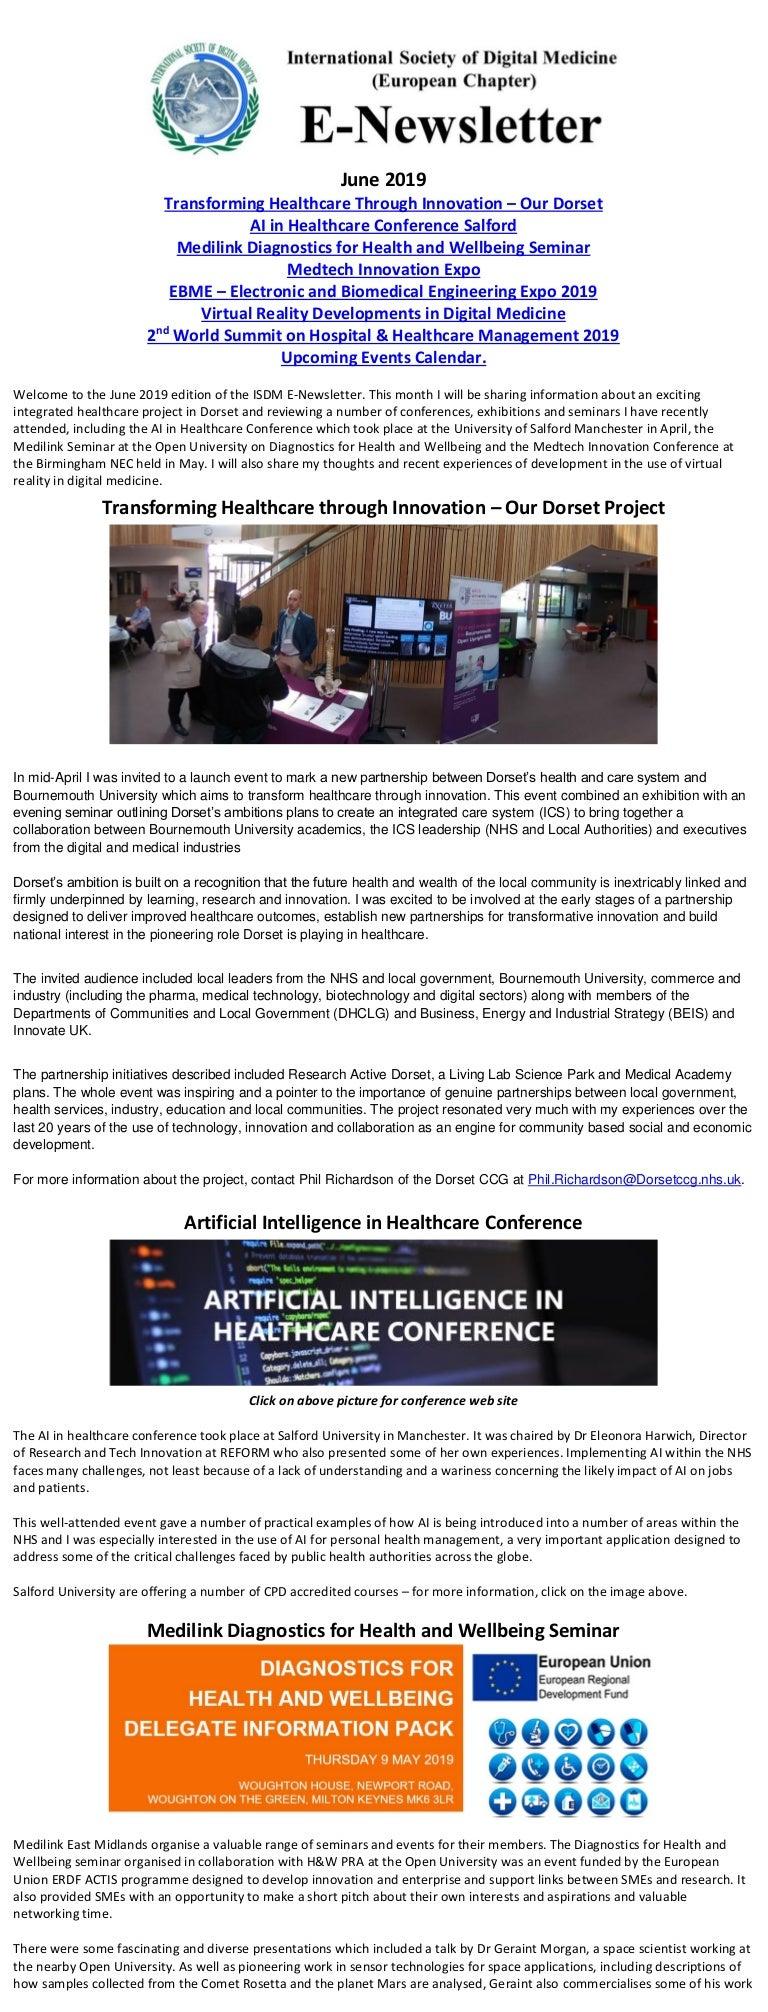 Transforming healthcare through innovation ISDM e-newsletter